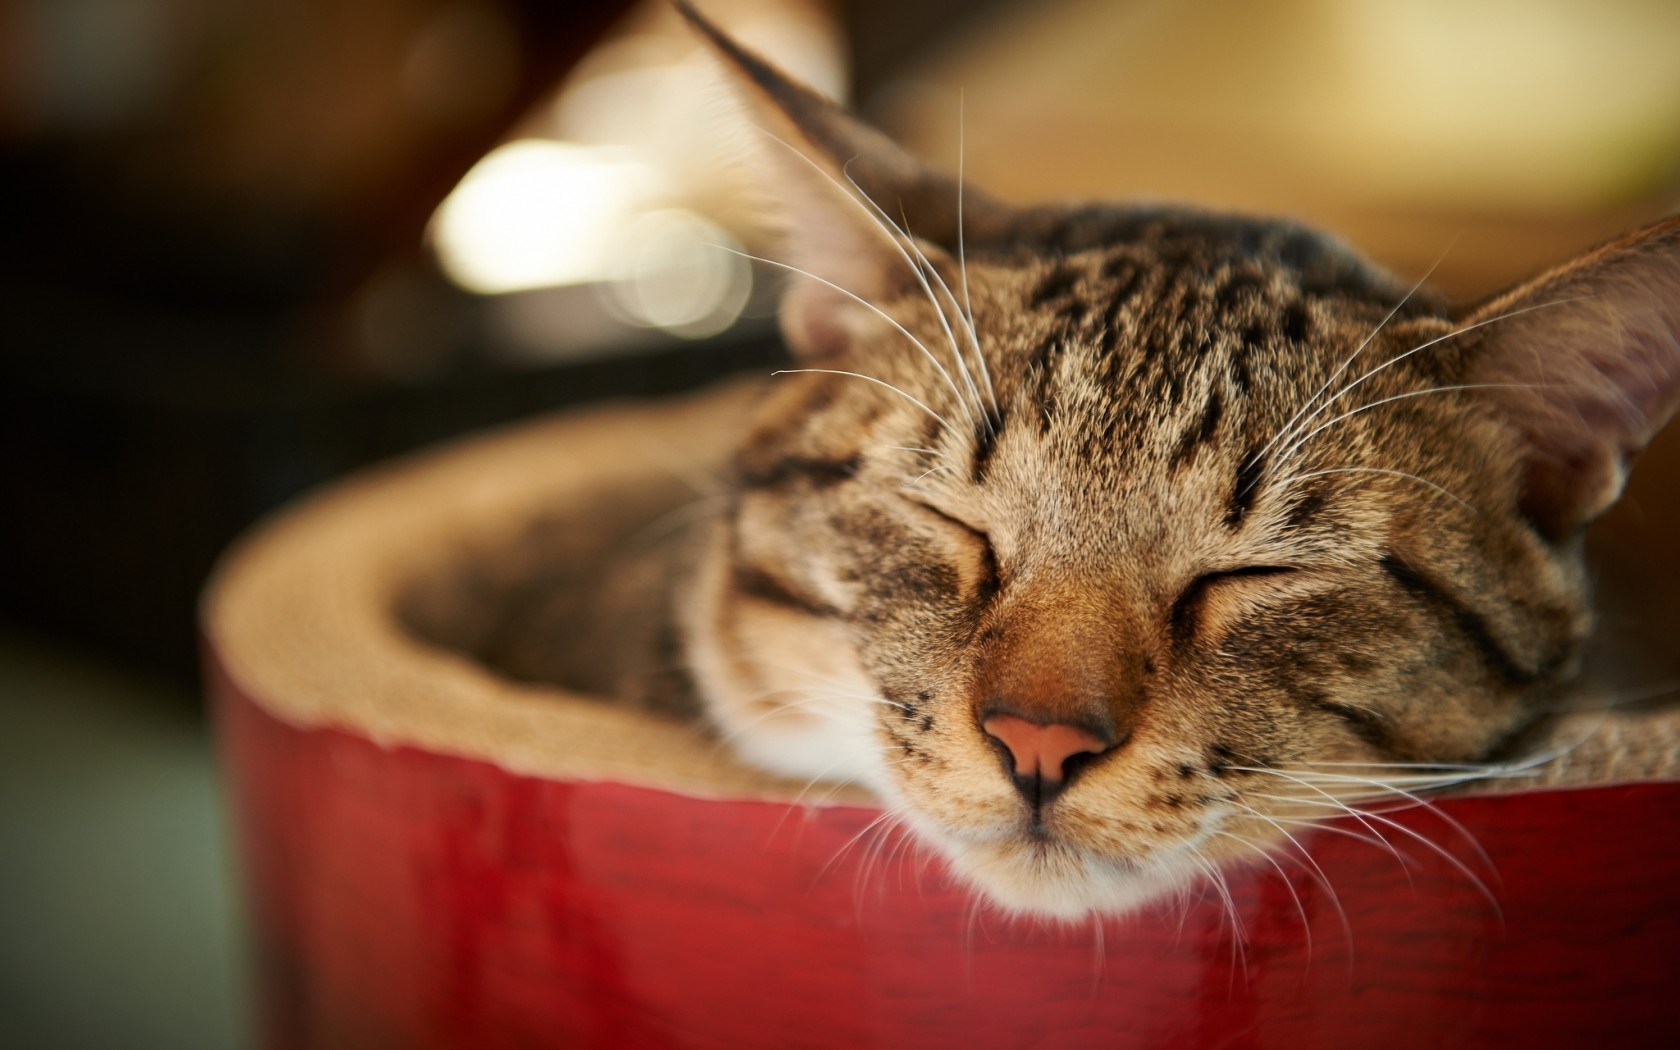 Cool Cute 3d Wallpapers Cat Resting Hd Desktop Wallpapers 4k Hd